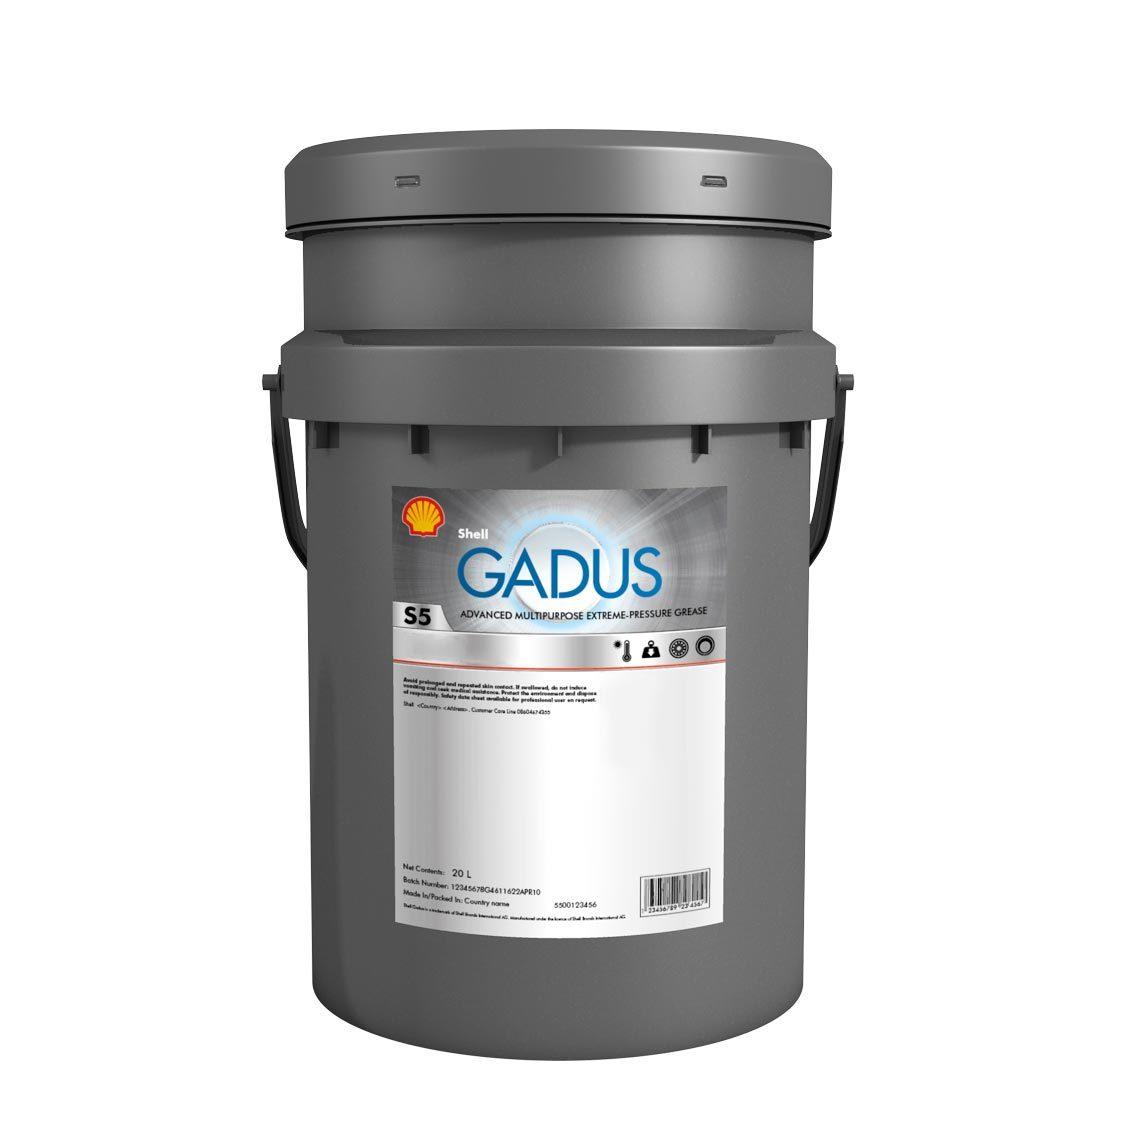 Пластичные Смазки Shell Gadus S5 V150XKD 0/00 s5.jpg